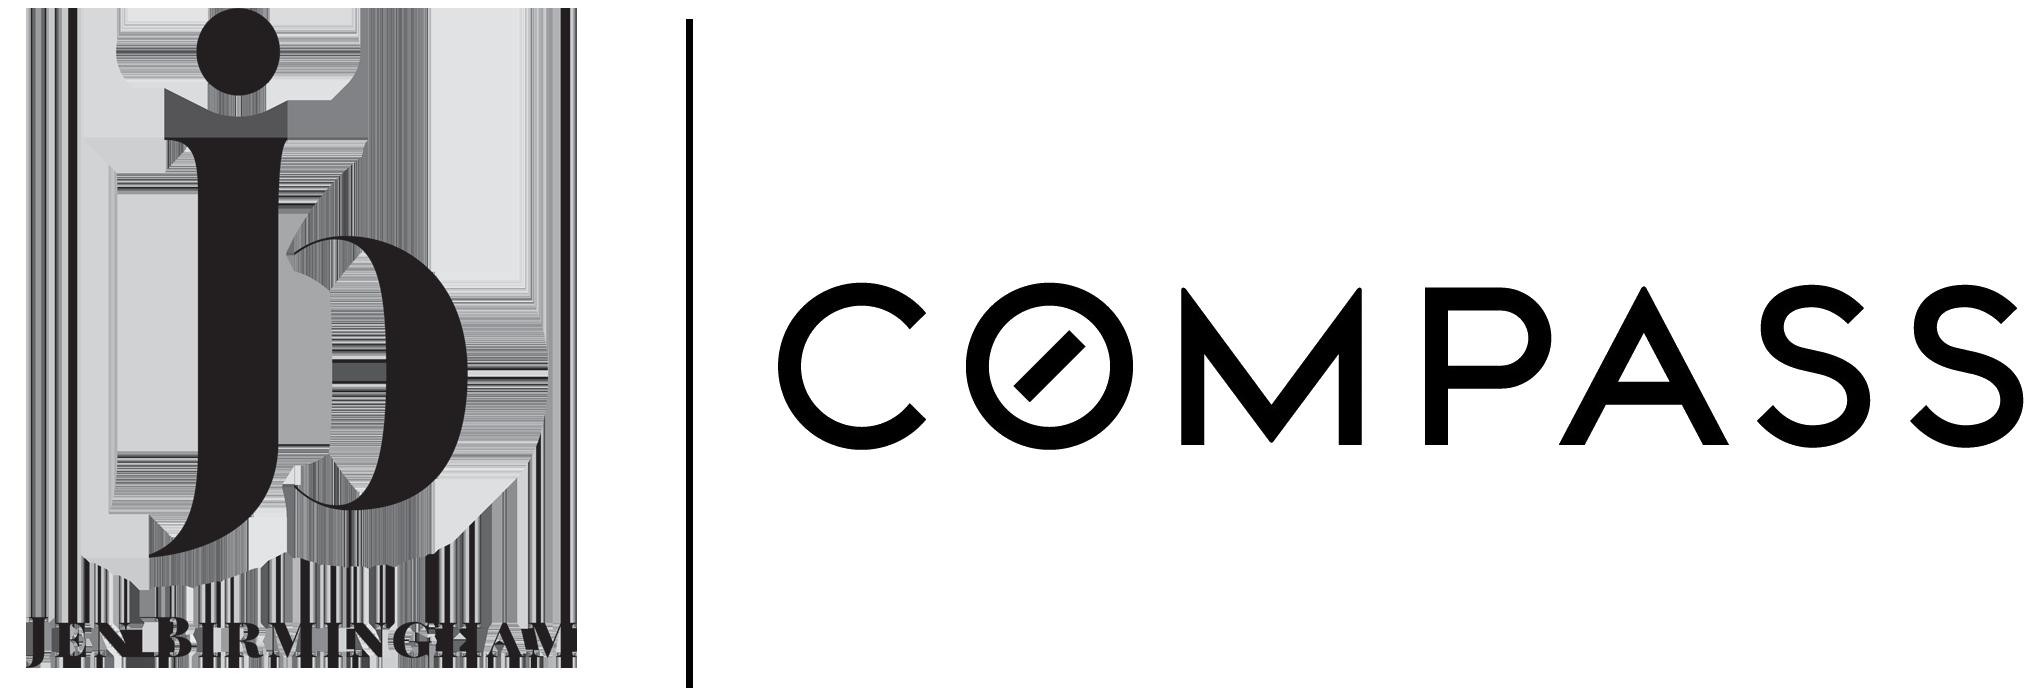 Jen Birmingham | Compass